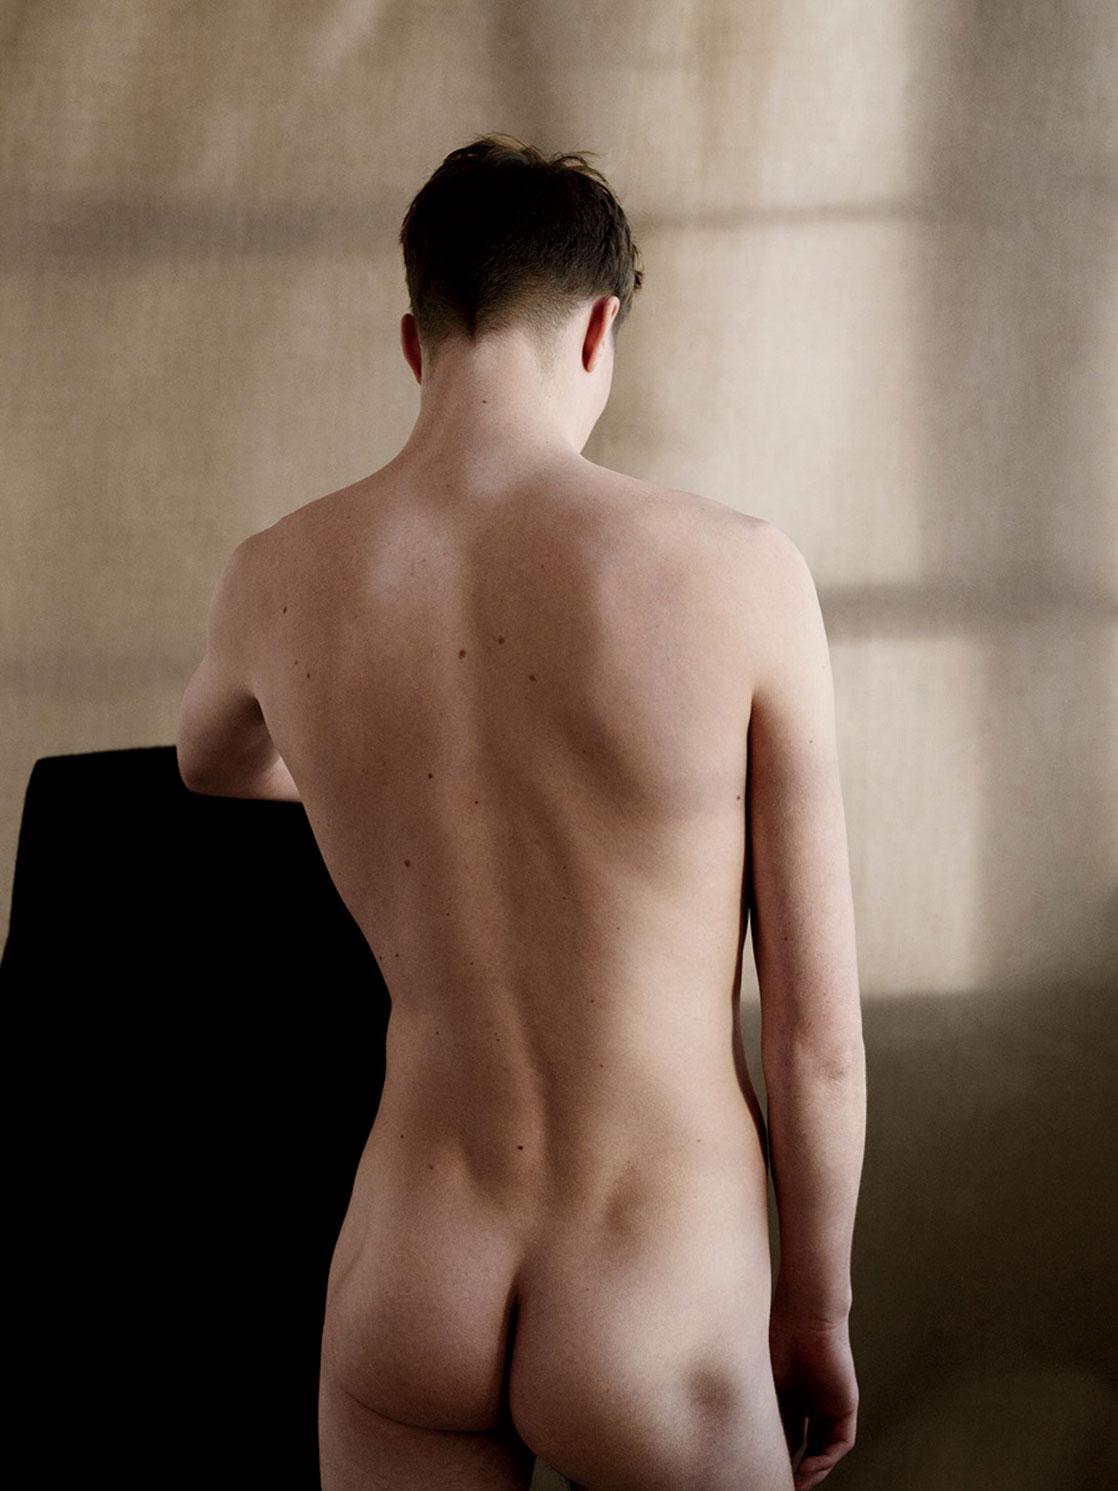 Jonathan knight nude sexual wemen